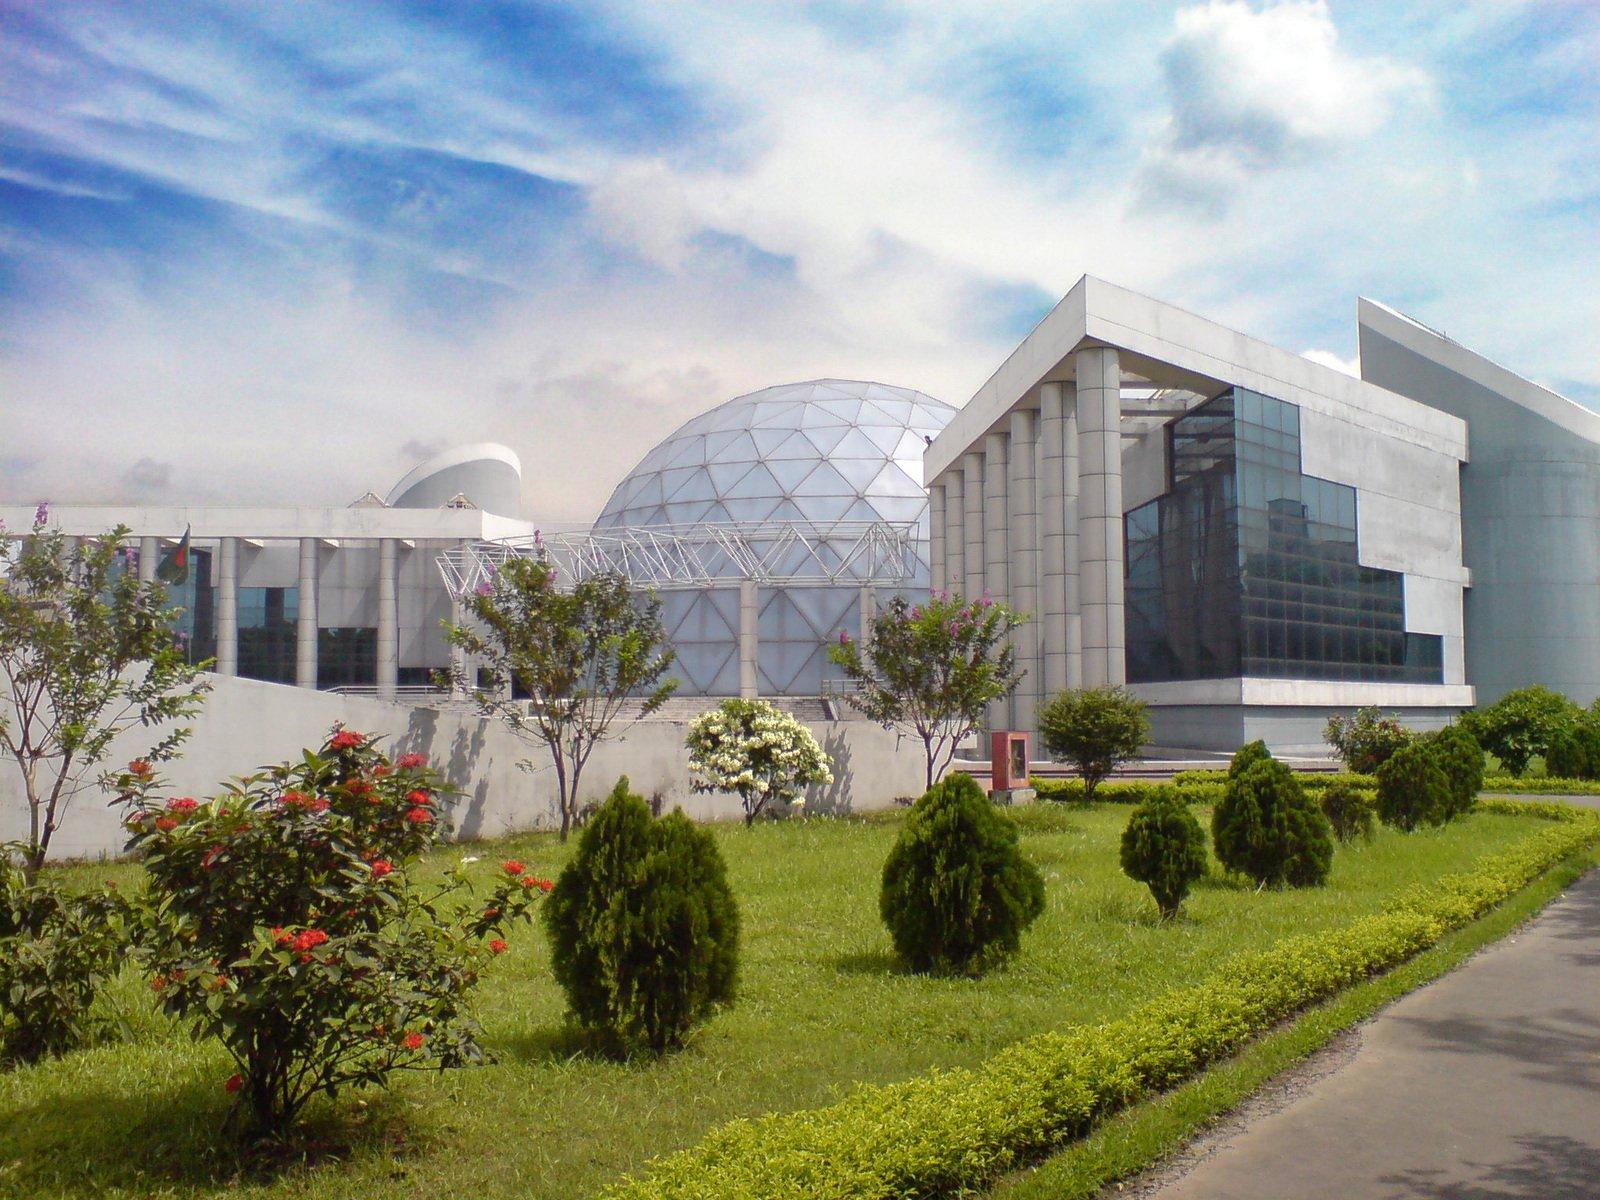 Vasani Novo Theater, a planetarium in Bangladesh